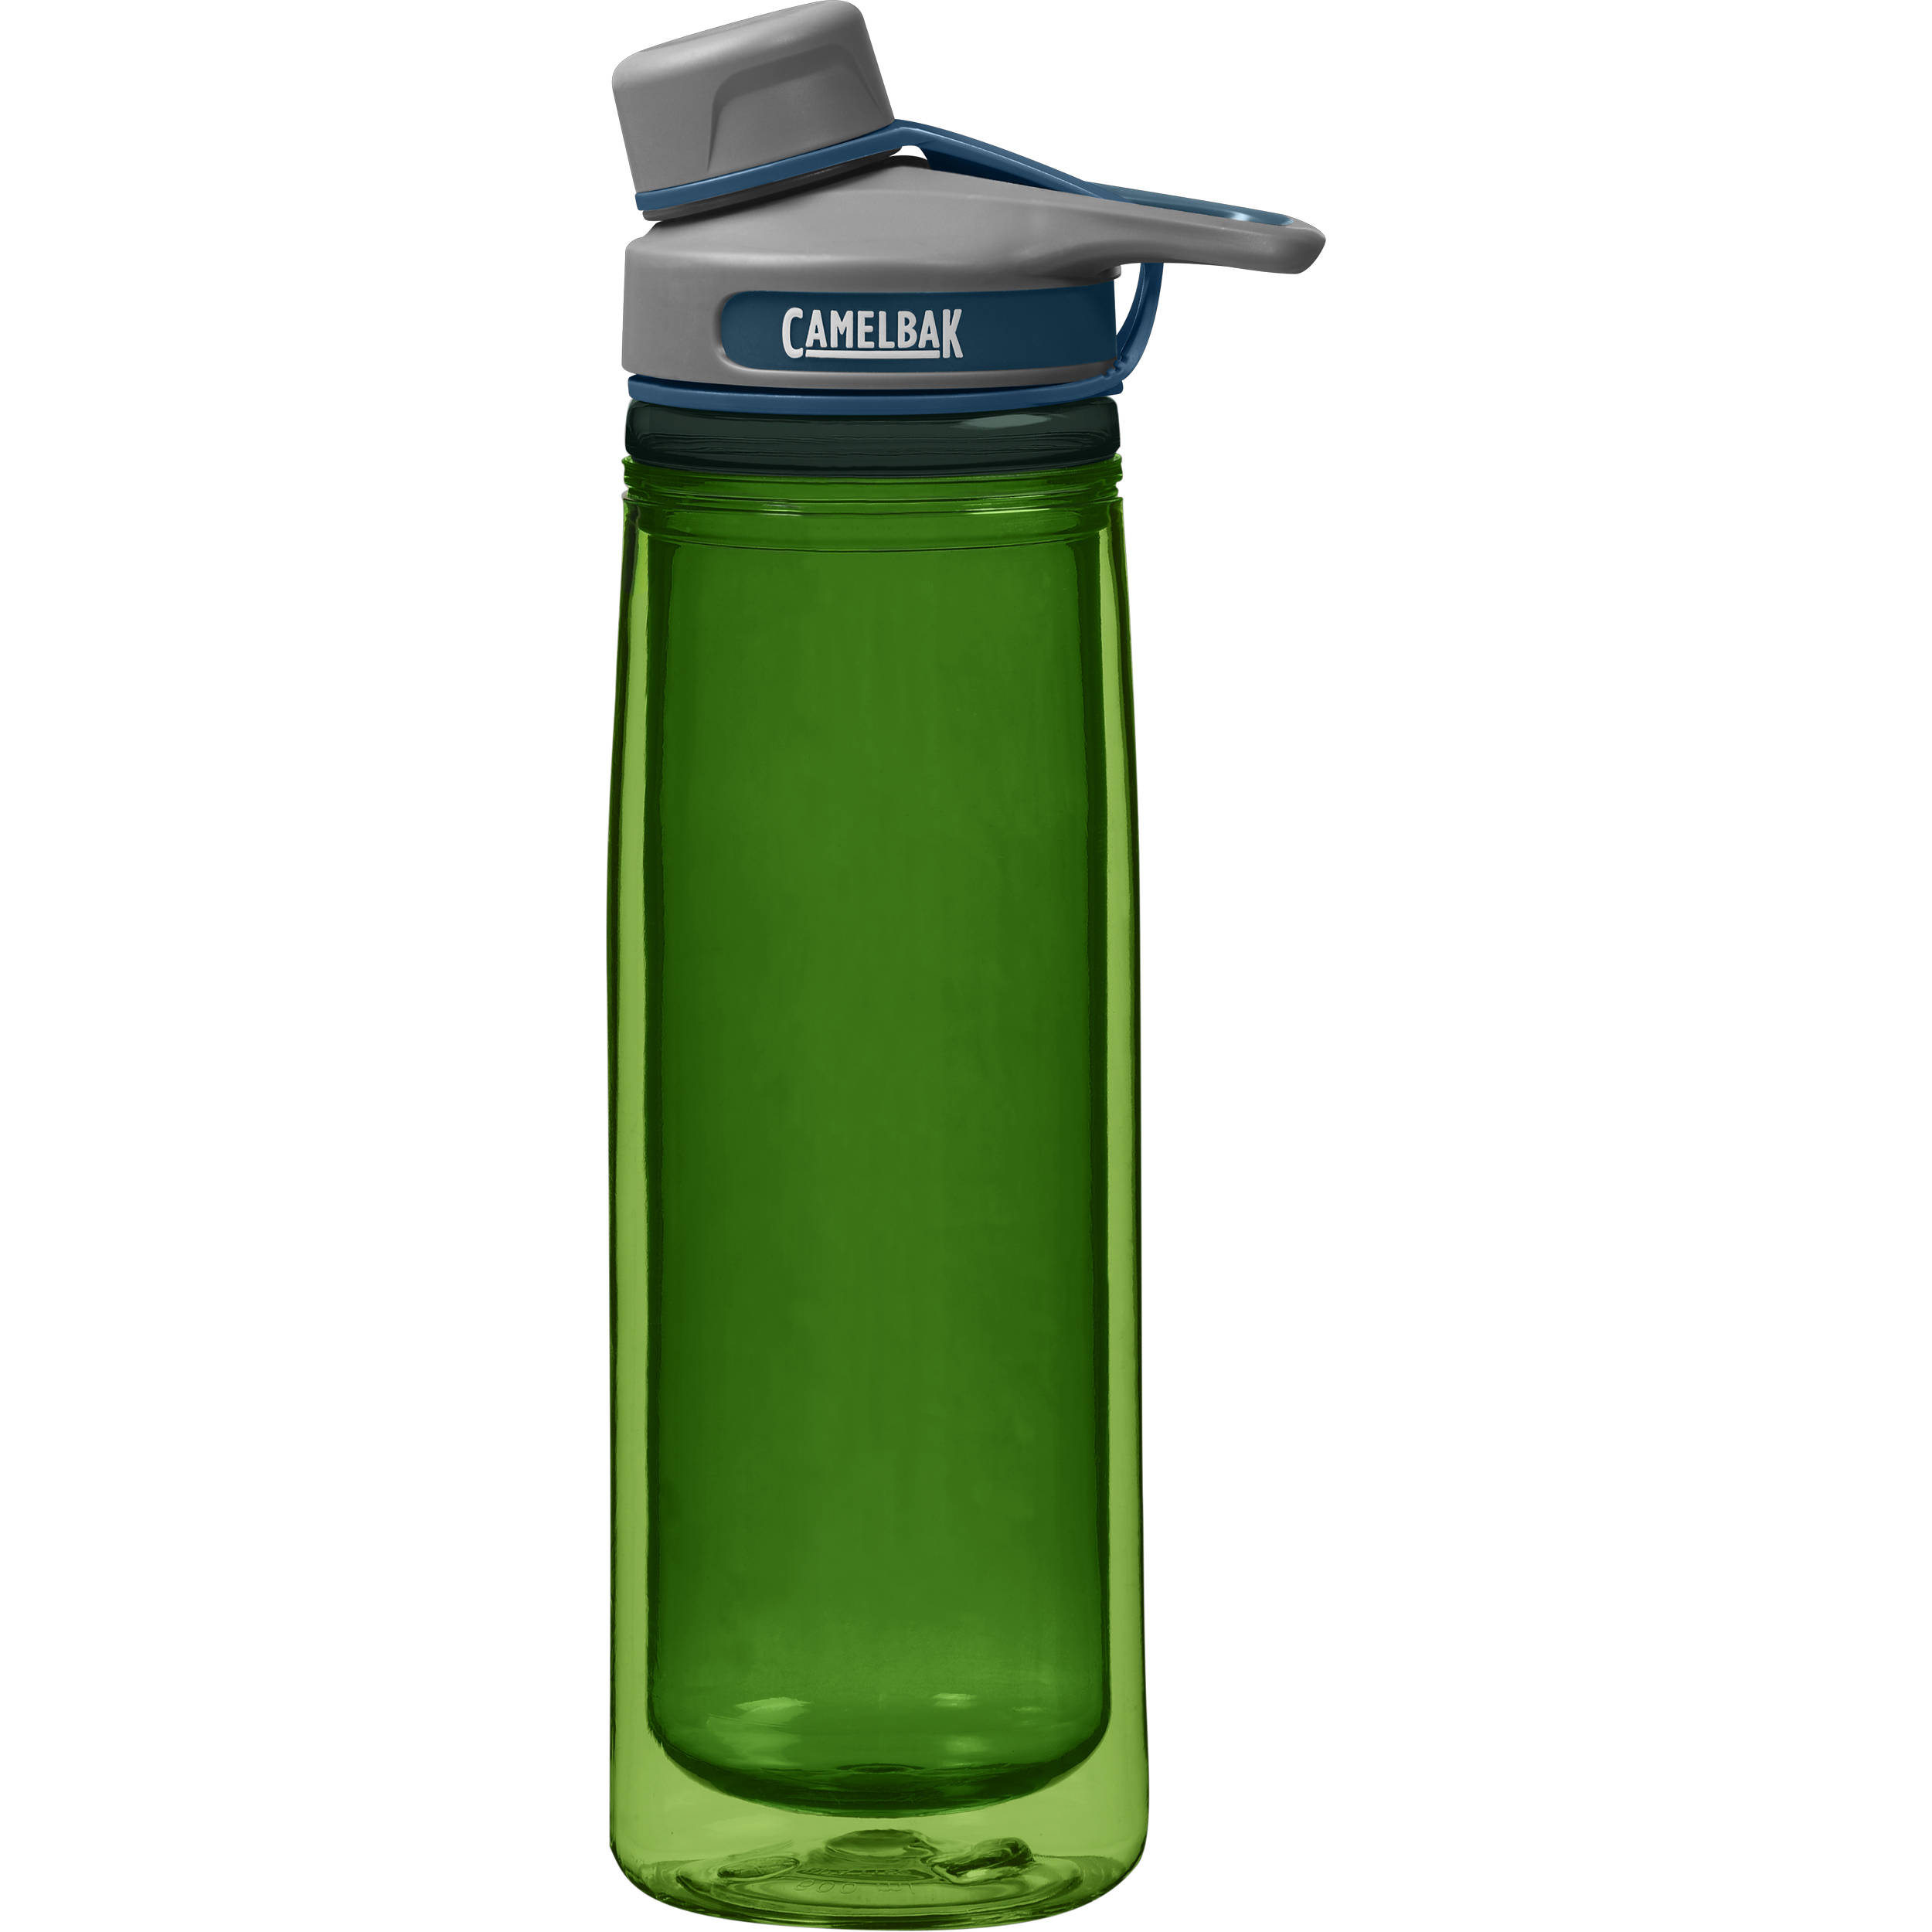 CAMELBAK Chute Insulated Water Bottle (20 fl oz, Earth) 53652